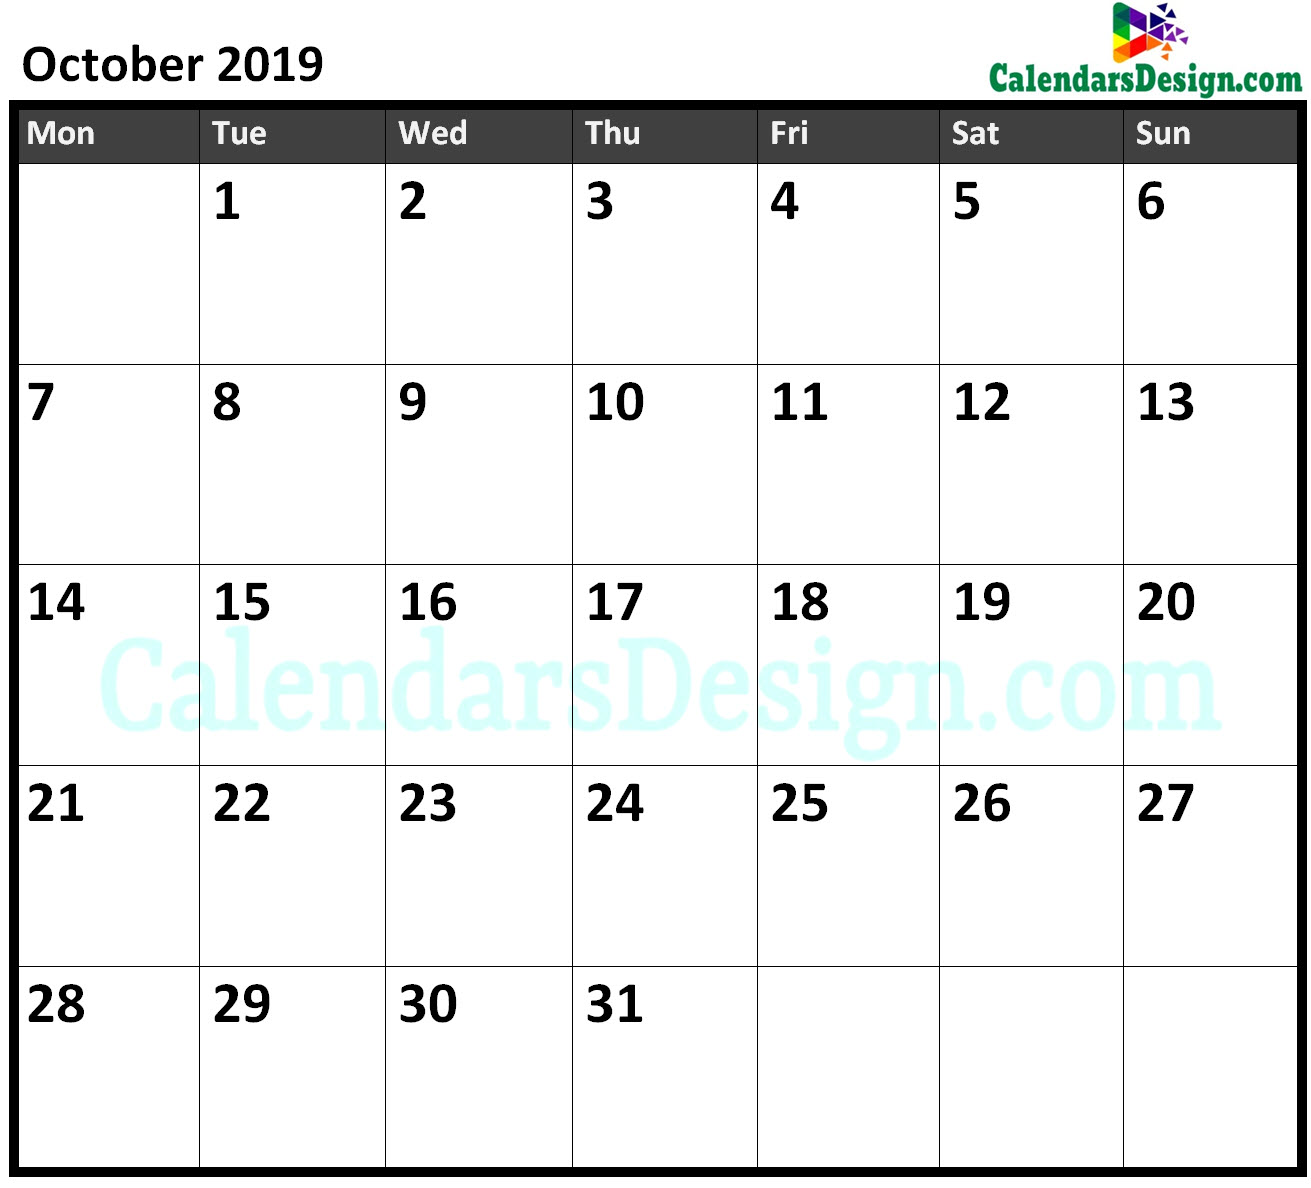 October 2019 Calendar Excel